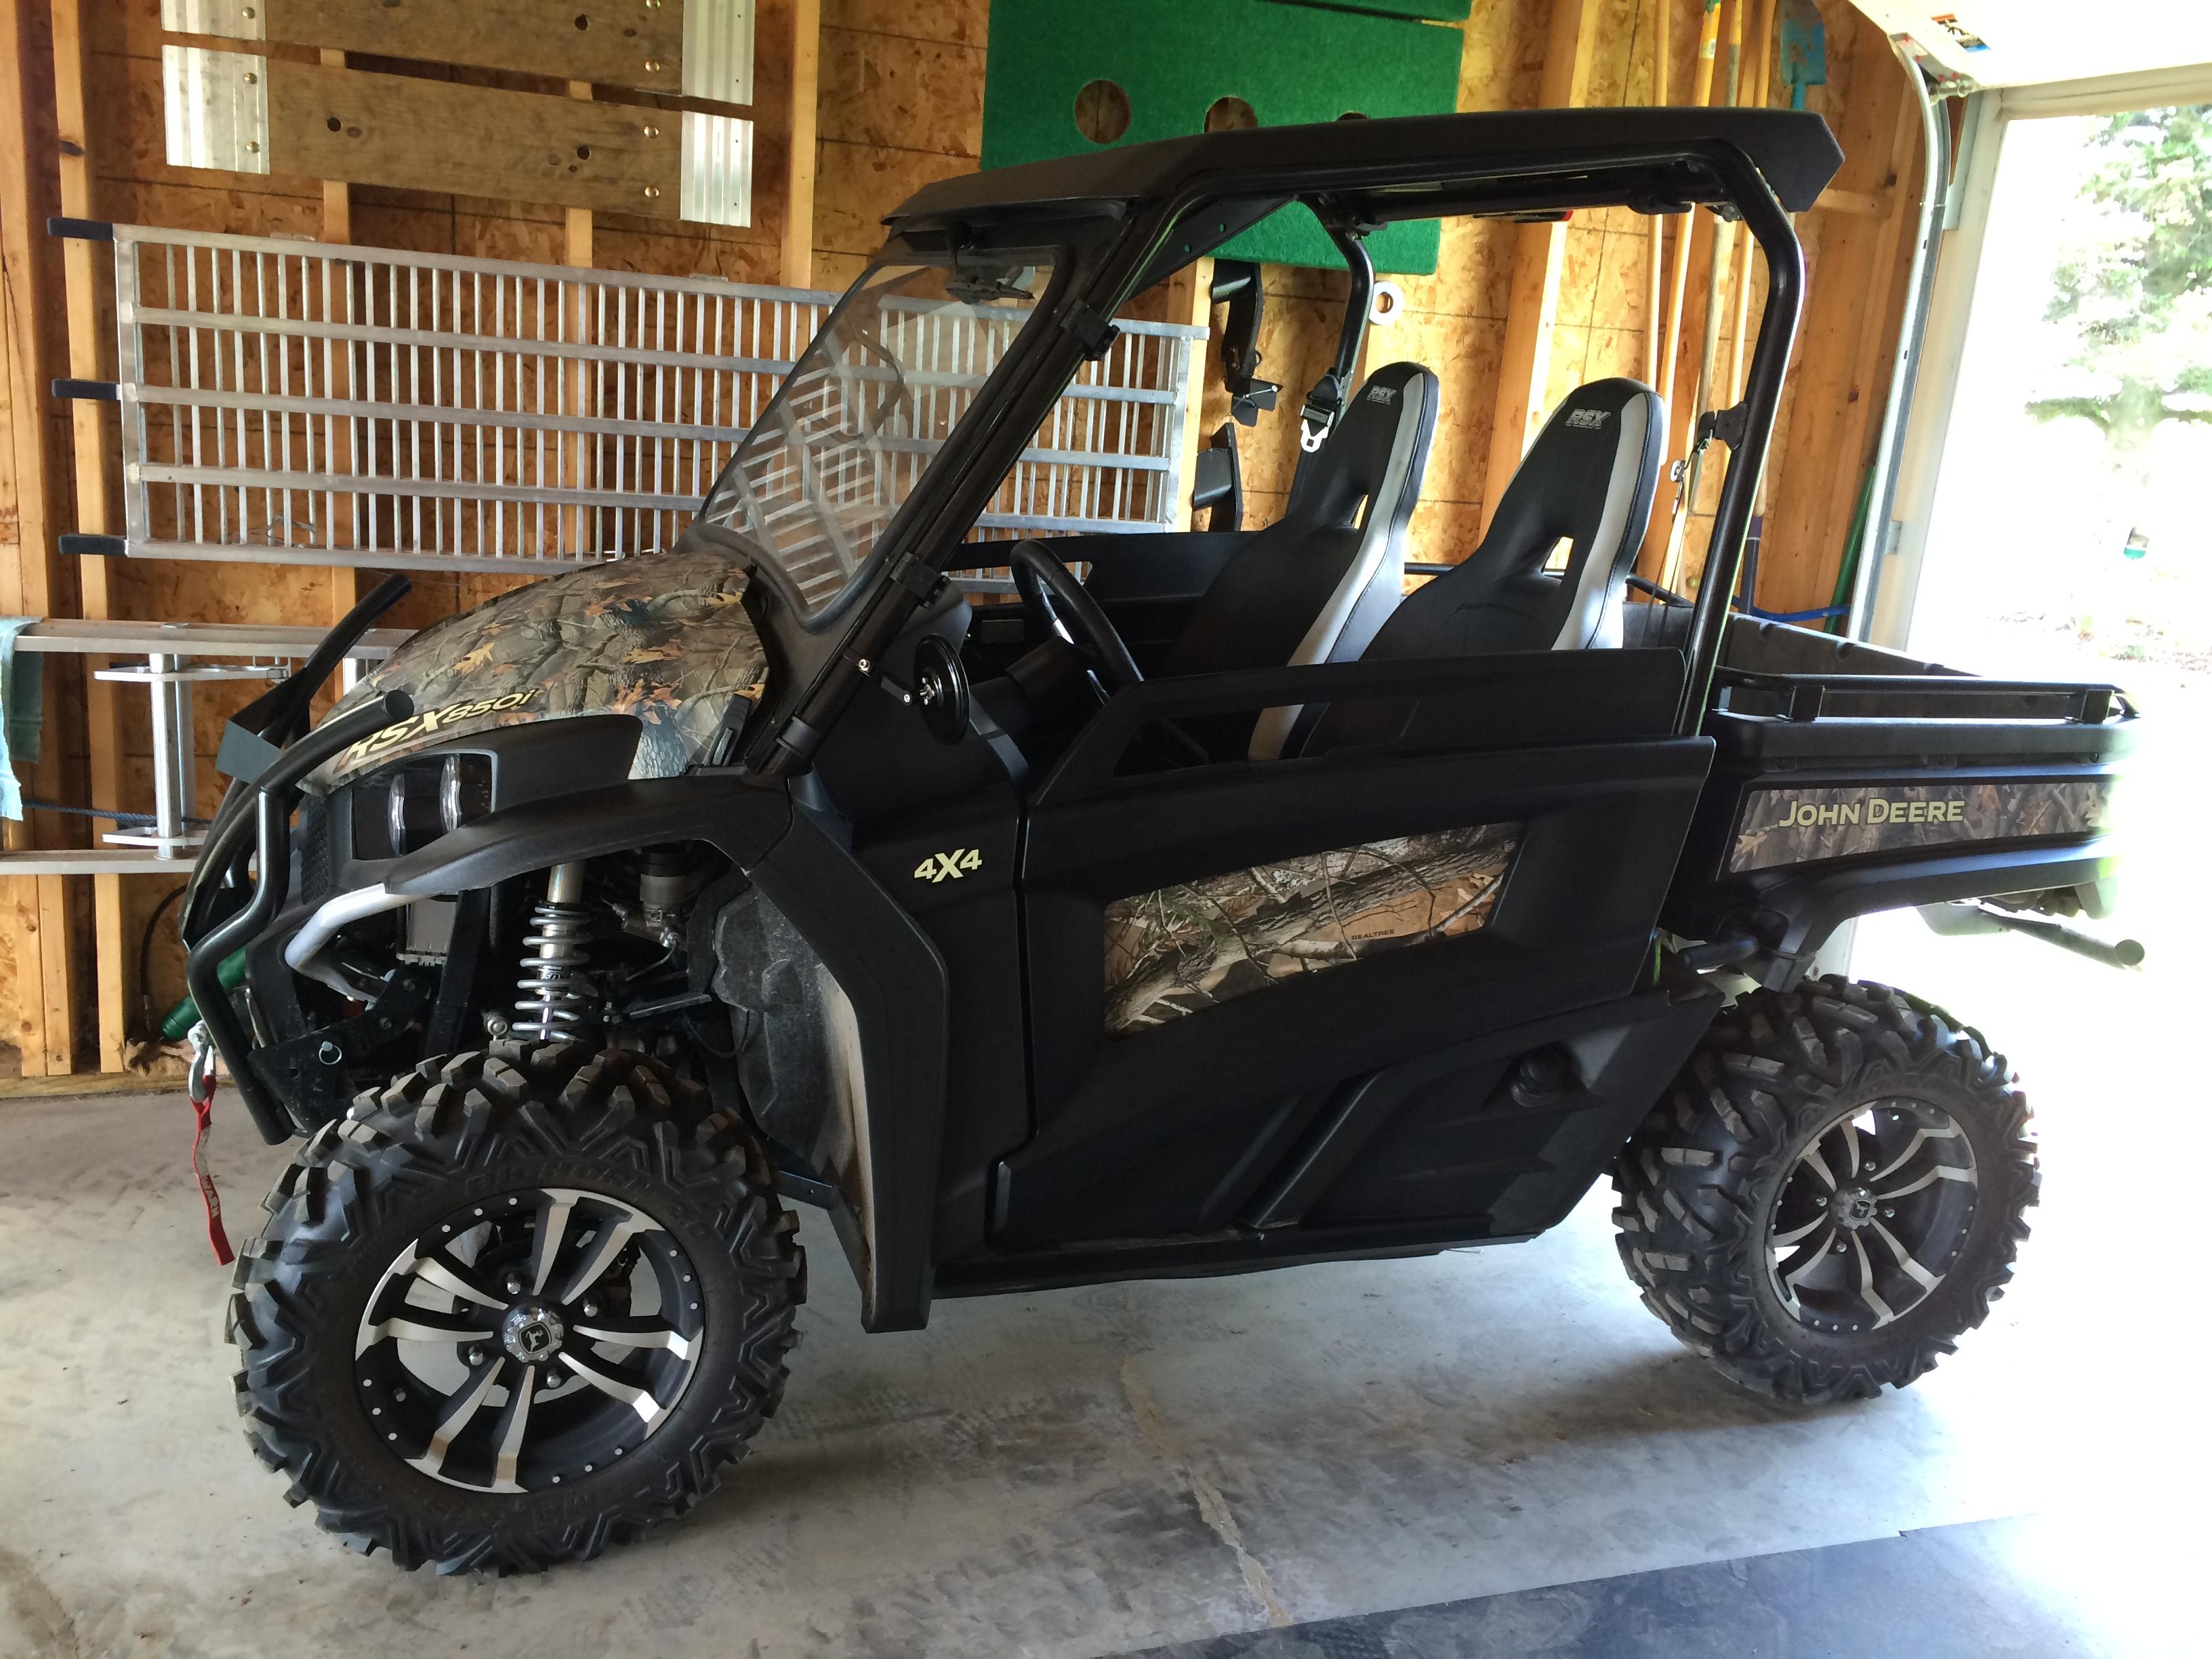 Rsx850i Custom Door Inserts John Deere Gator Forums